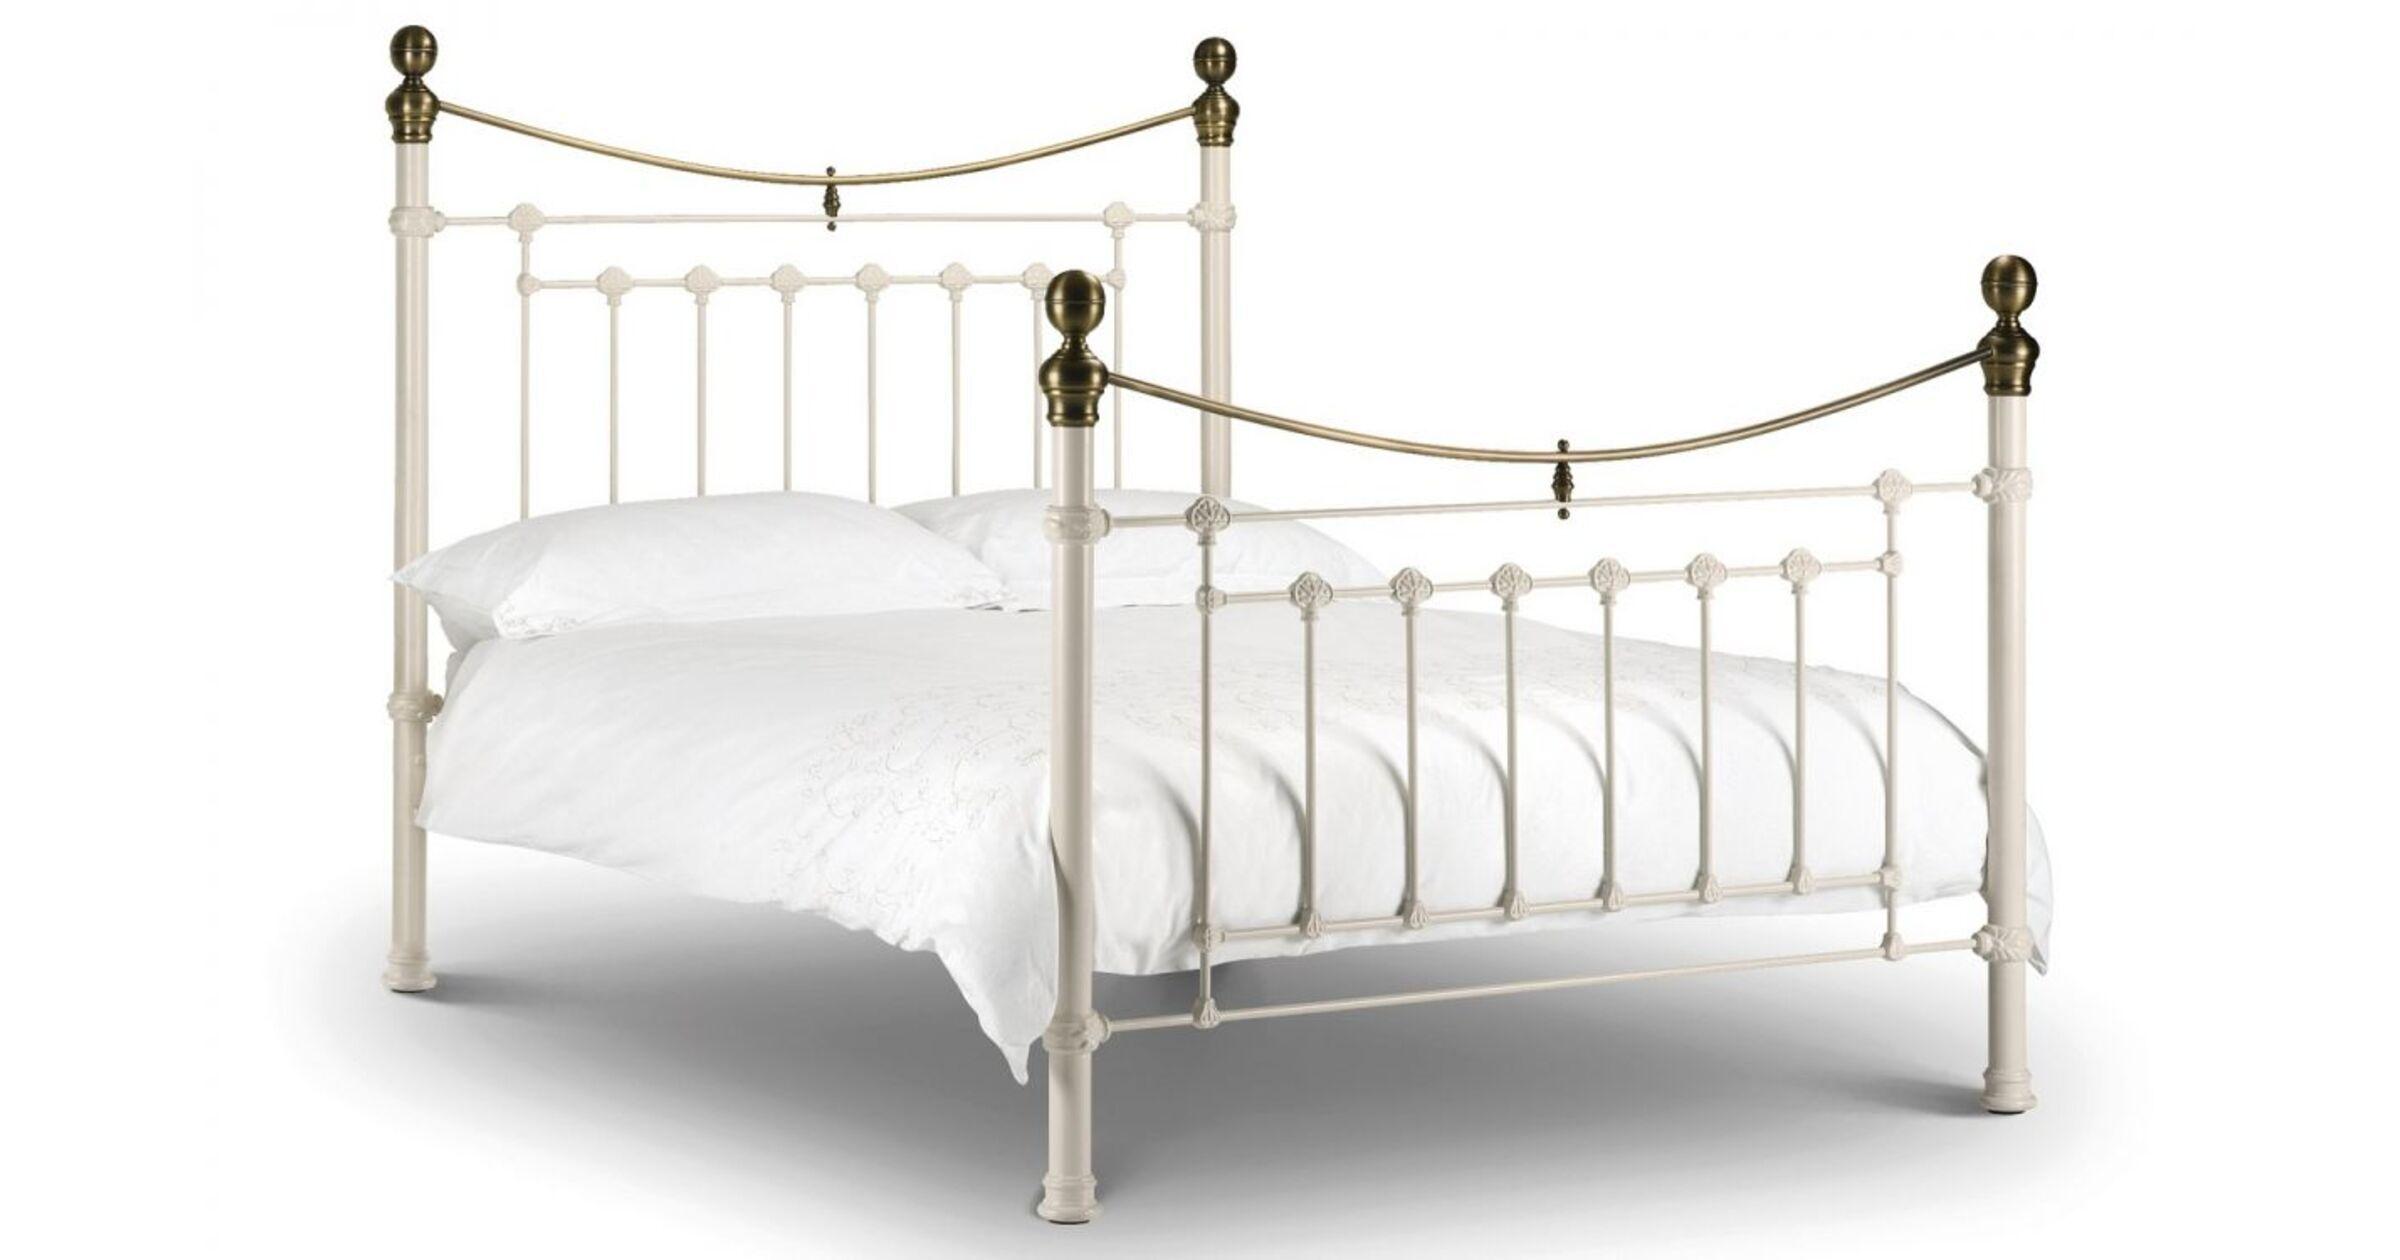 Alexander 150cm Stone White And Brass Bed Designer Sofas4u